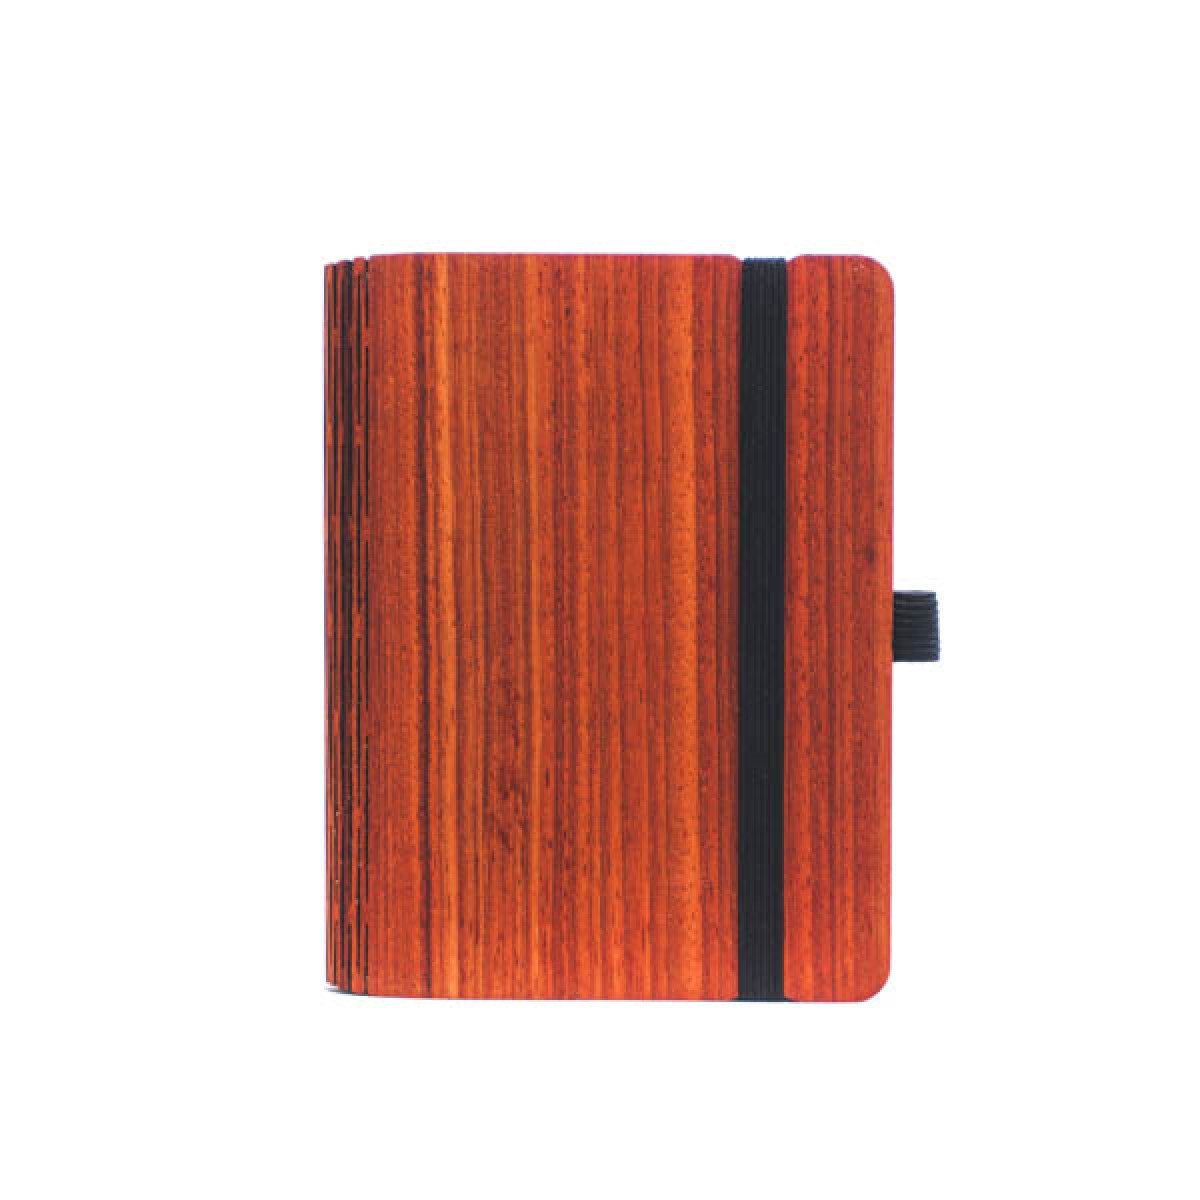 JUNGHOLZ Design Notizbuch, WoodBook, Padouk, A6